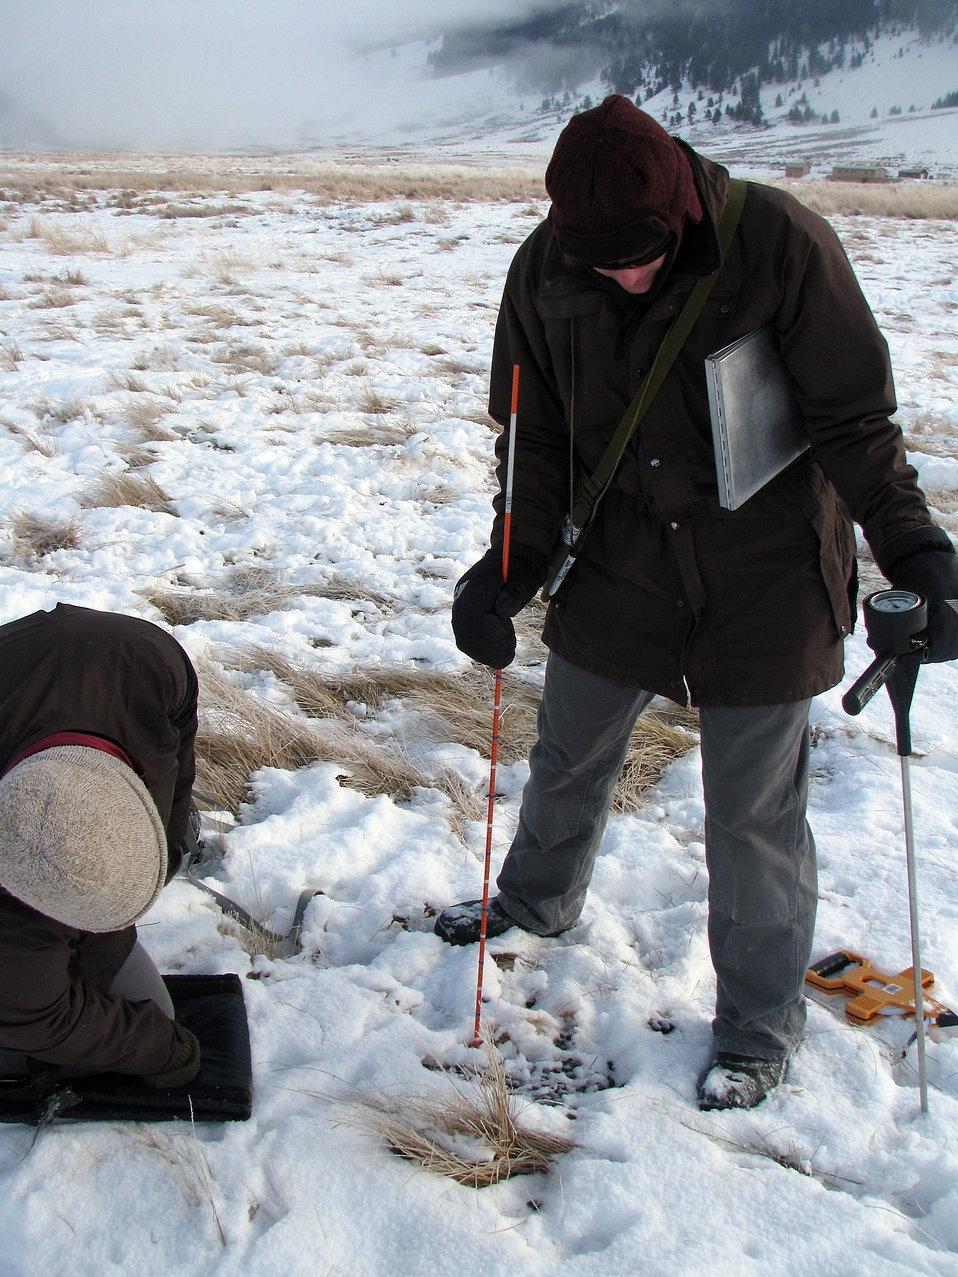 Environmental Sampling at the National Elk Refuge